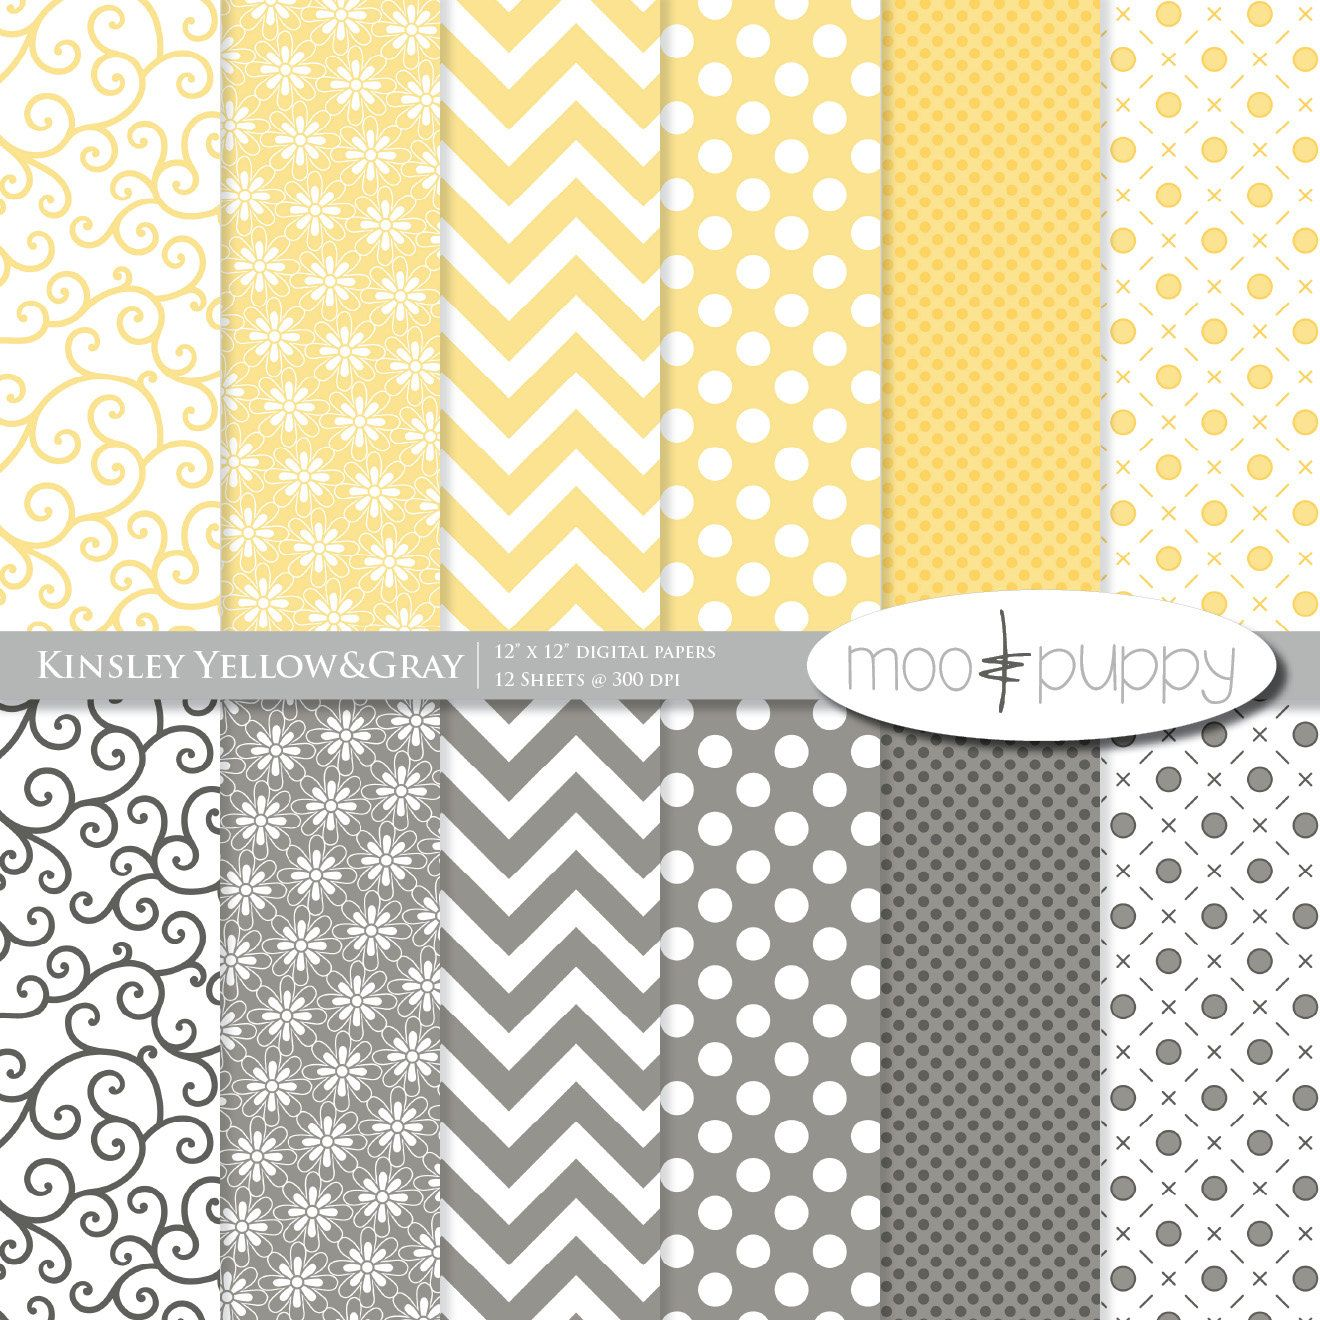 Scrapbook paper etsy - Yellow Digital Scrapbooking Paper Pack Kinsley Yellow And Gray Buy 2 Get 1 Free